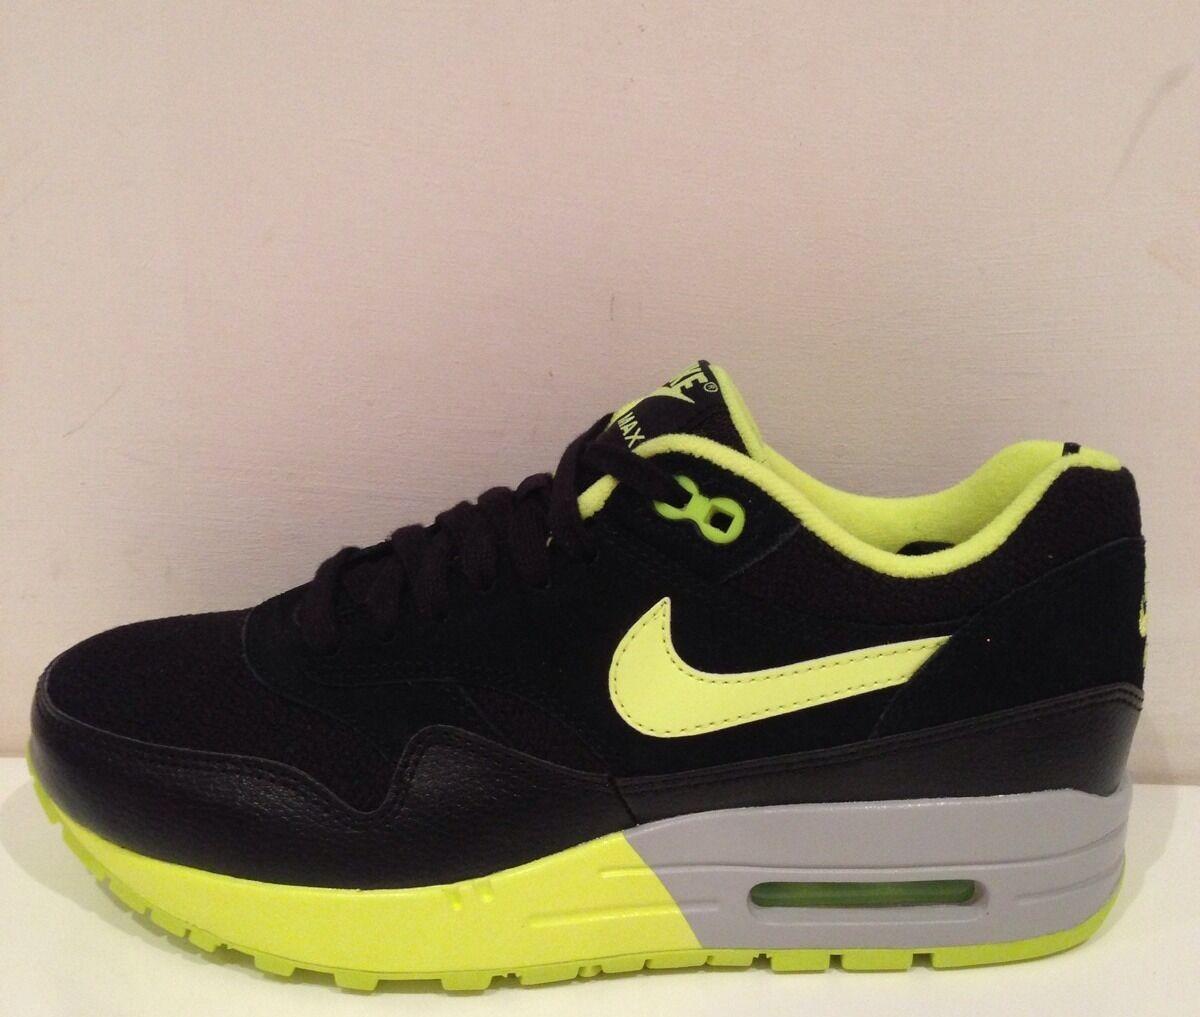 Nike AIR AIR AIR MAX 1 Taglia 3.5 (UK) NUOVO CON SCATOLA 819103